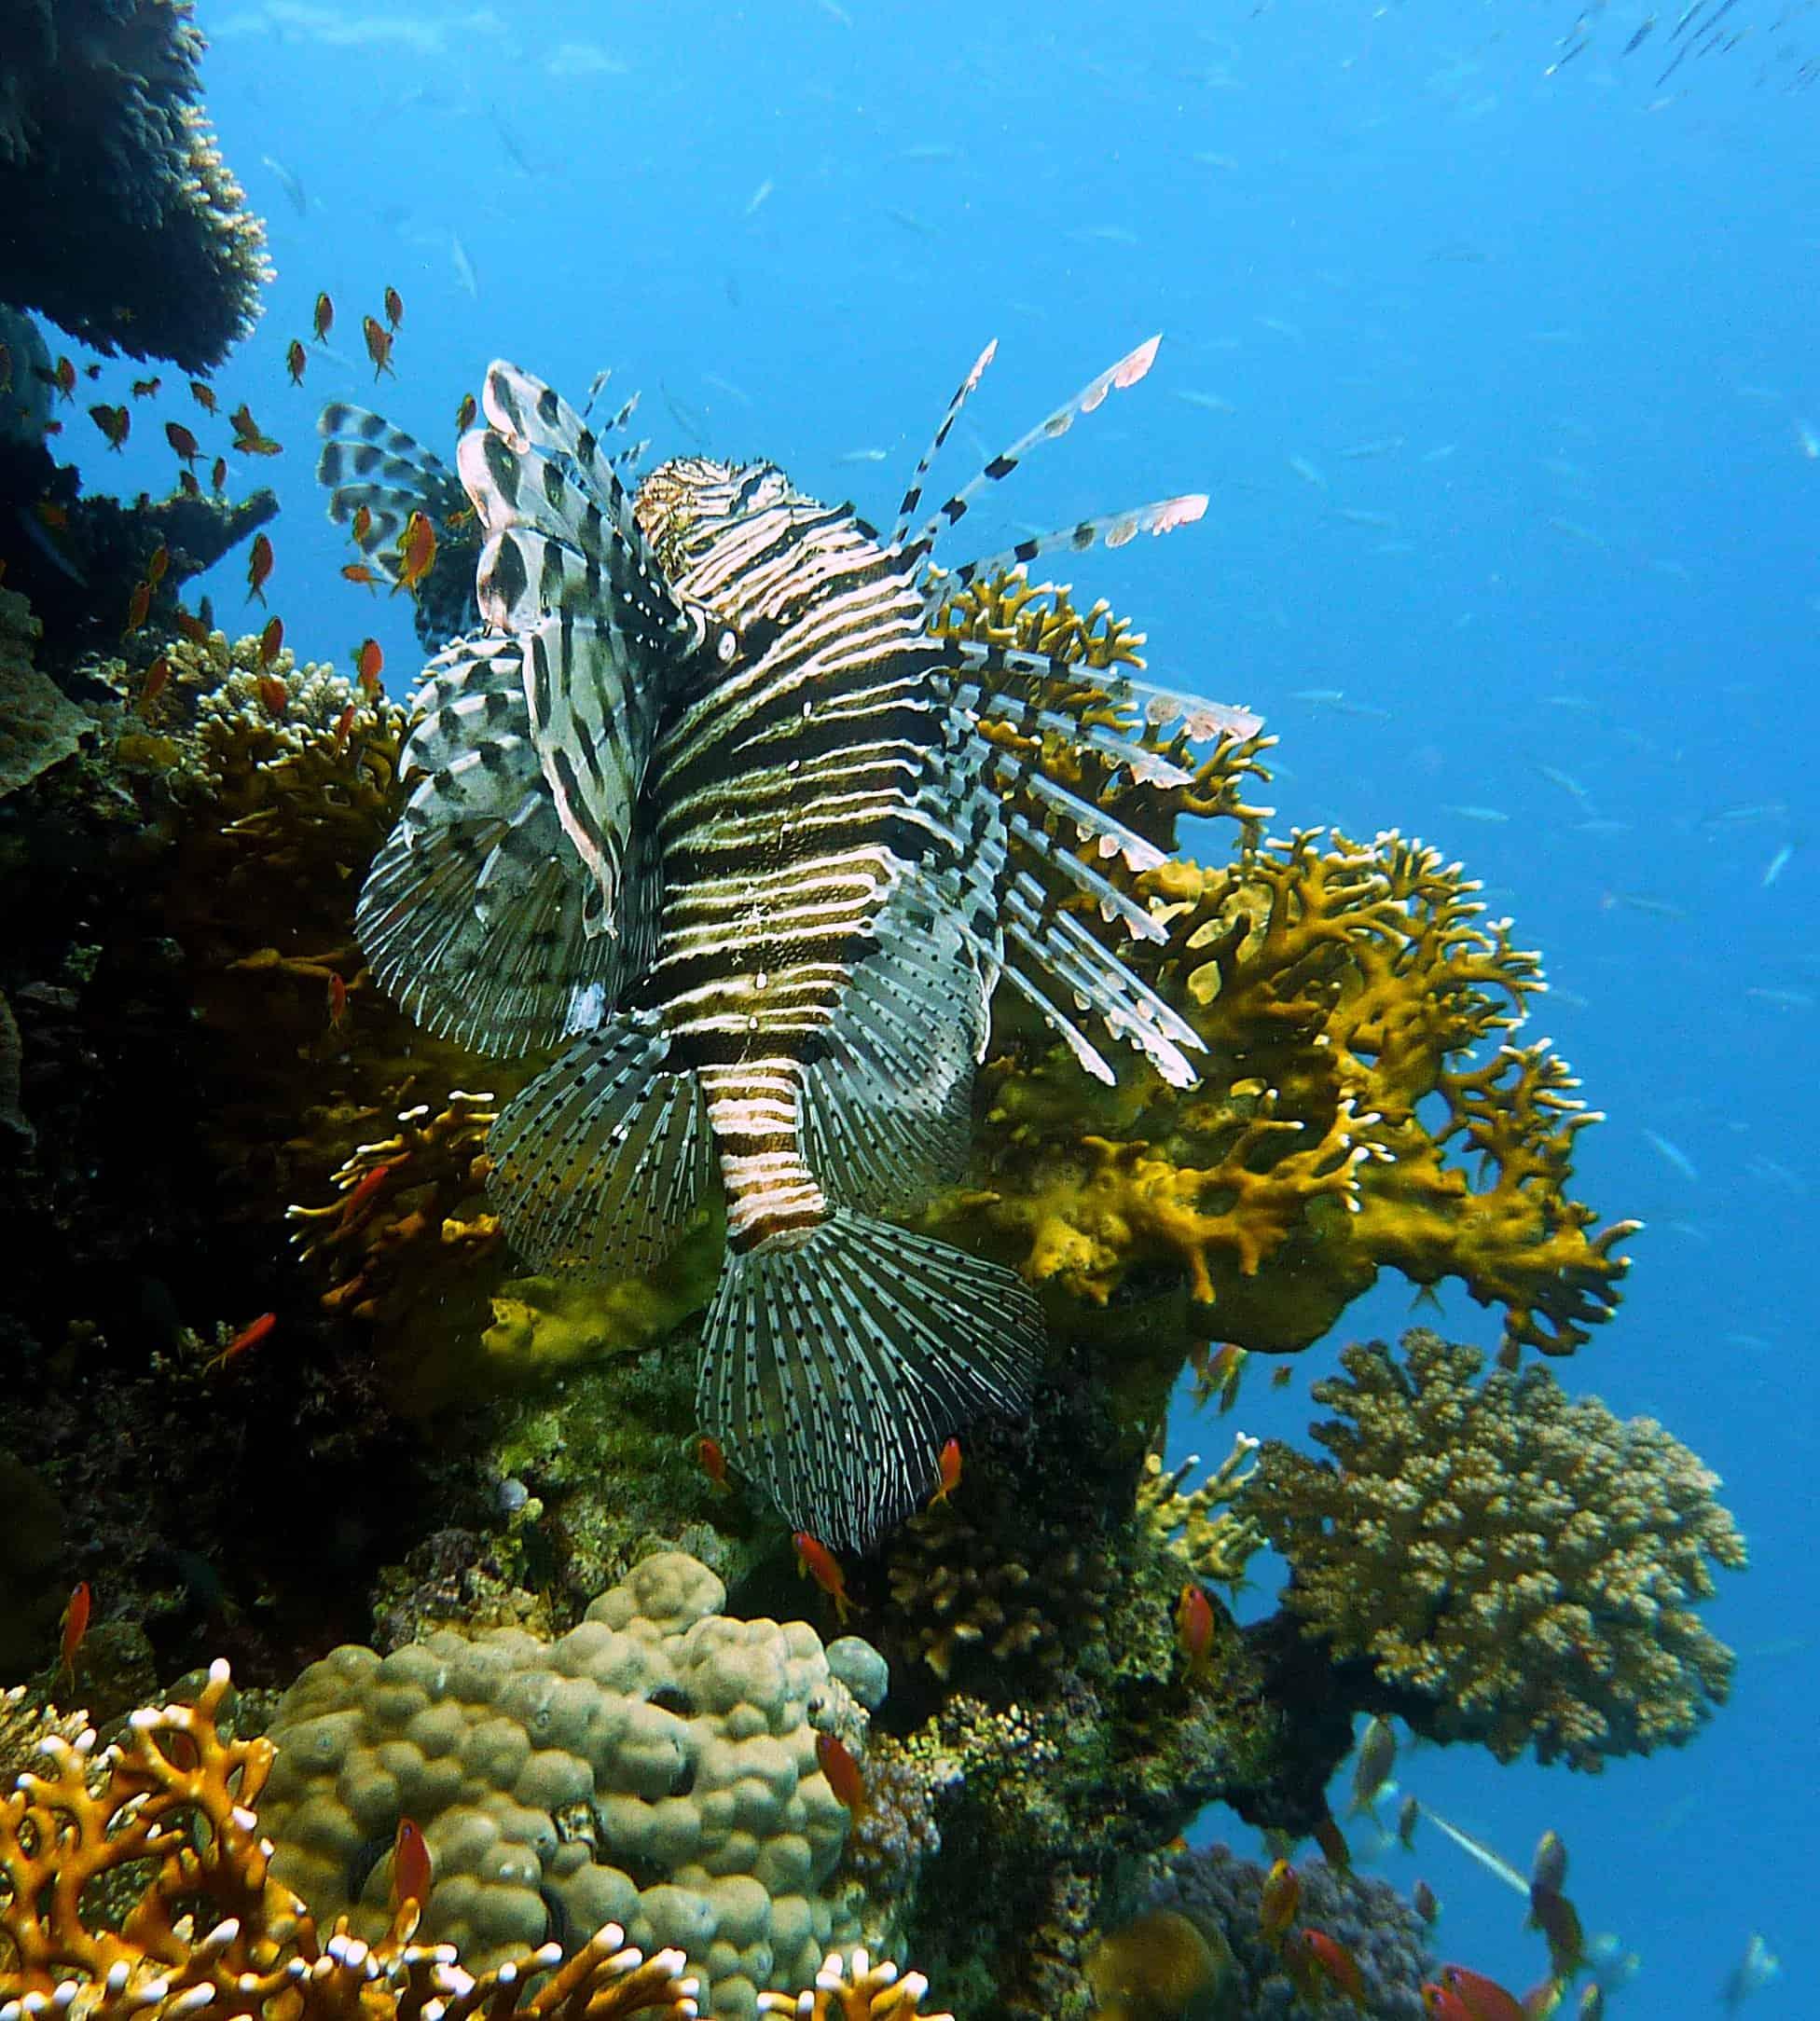 fotocamera subacquea, fotografia subacquea